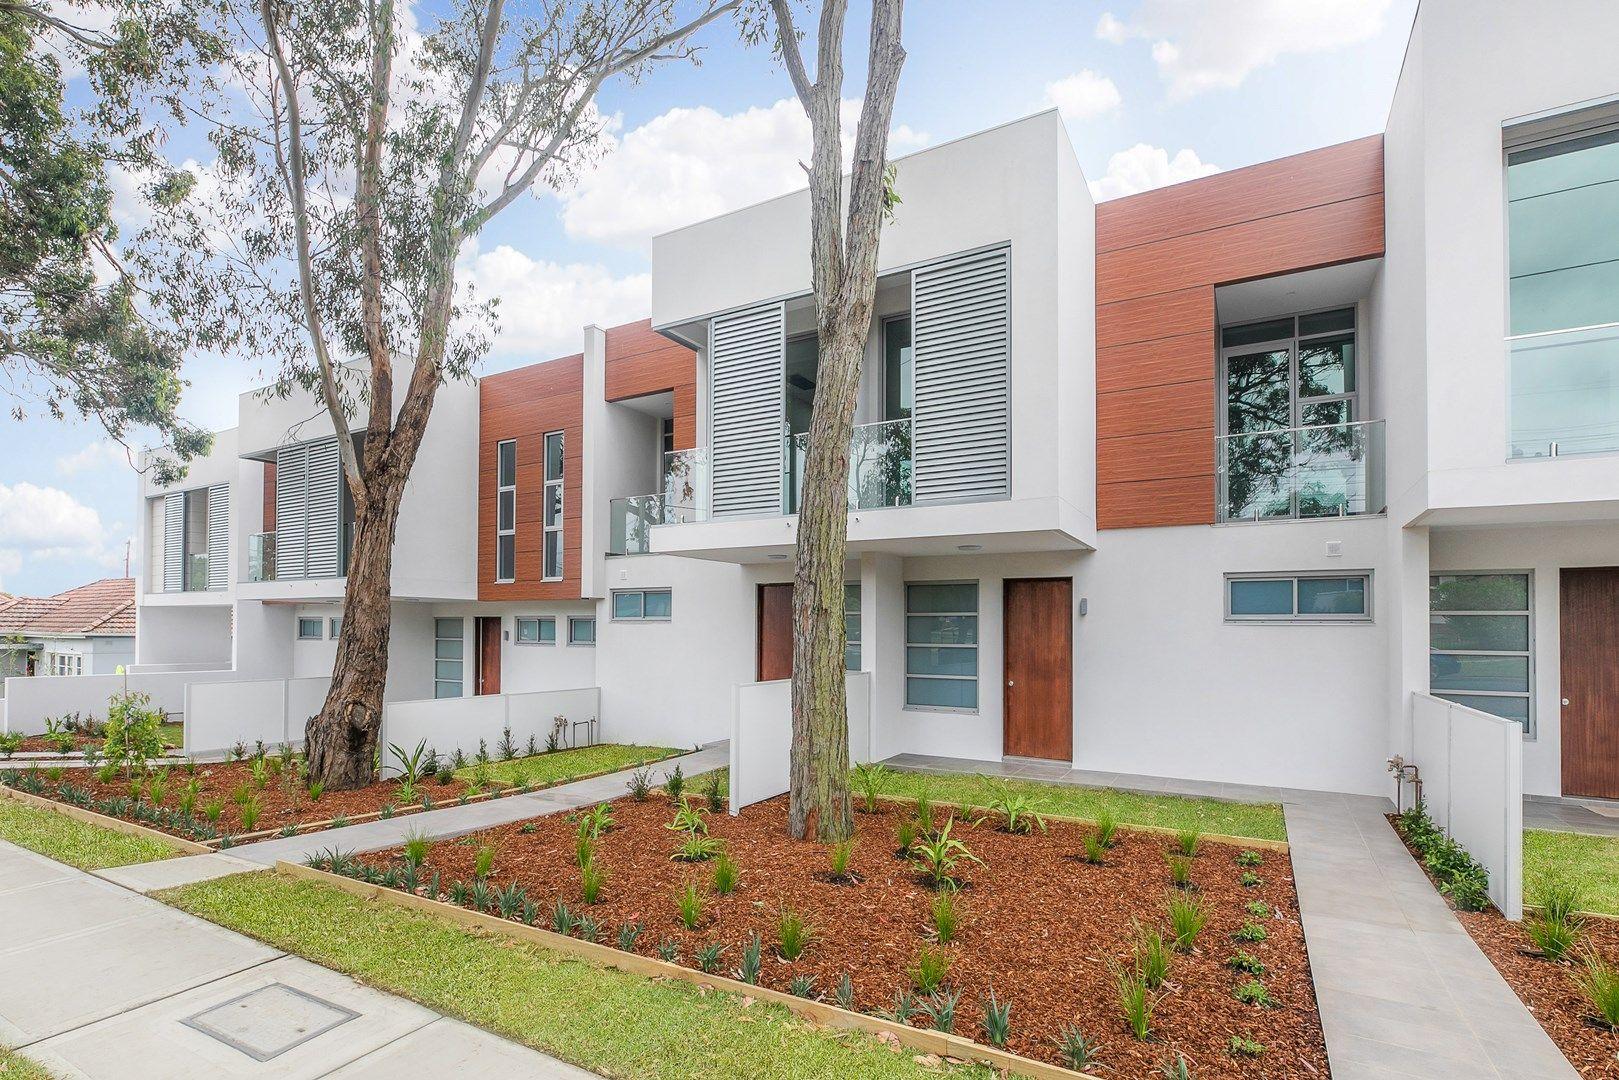 1/6 Hotham  Road, Kirrawee NSW 2232, Image 0